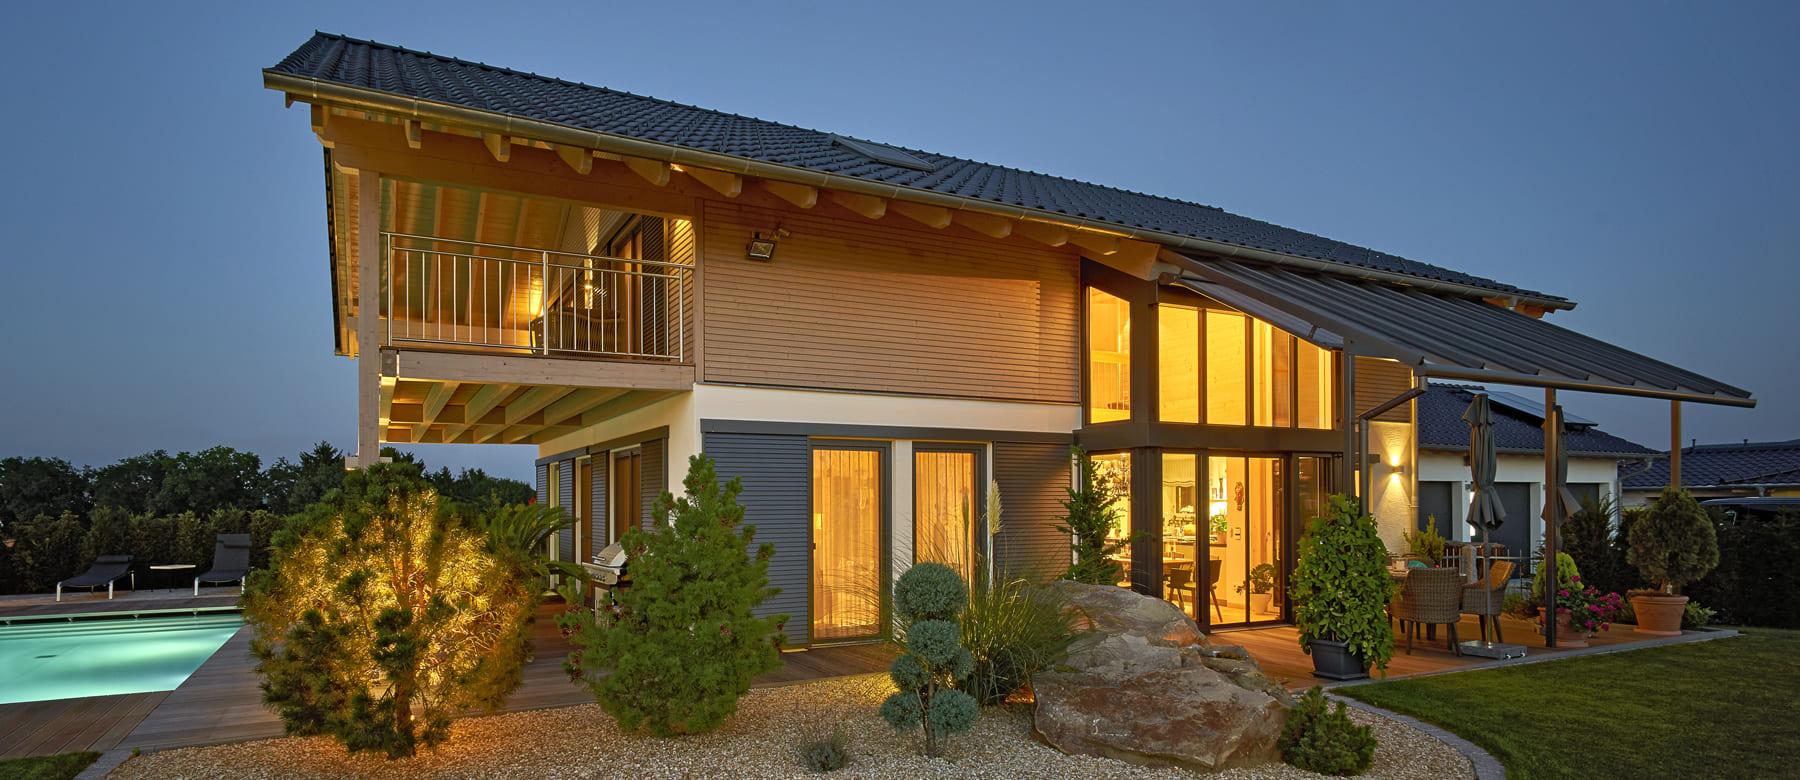 kosten blockhaus carina u blockhaus with kosten blockhaus simple ein blockhaus als fertighaus. Black Bedroom Furniture Sets. Home Design Ideas